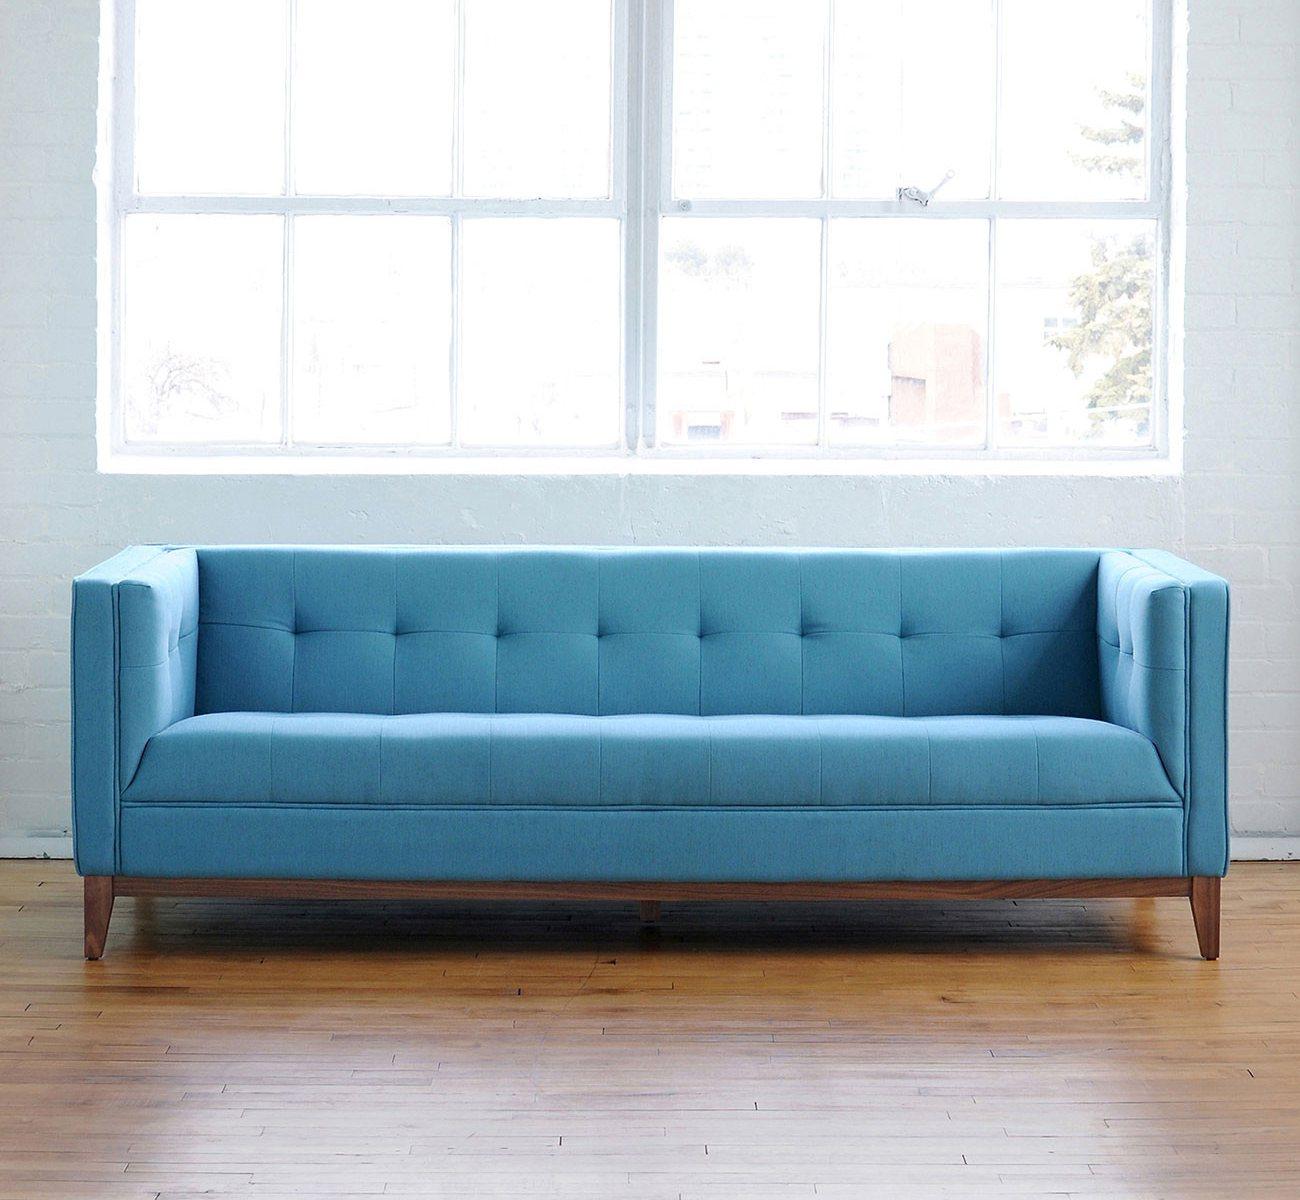 Awesome Atwood Sofa, Muskoka Surf.